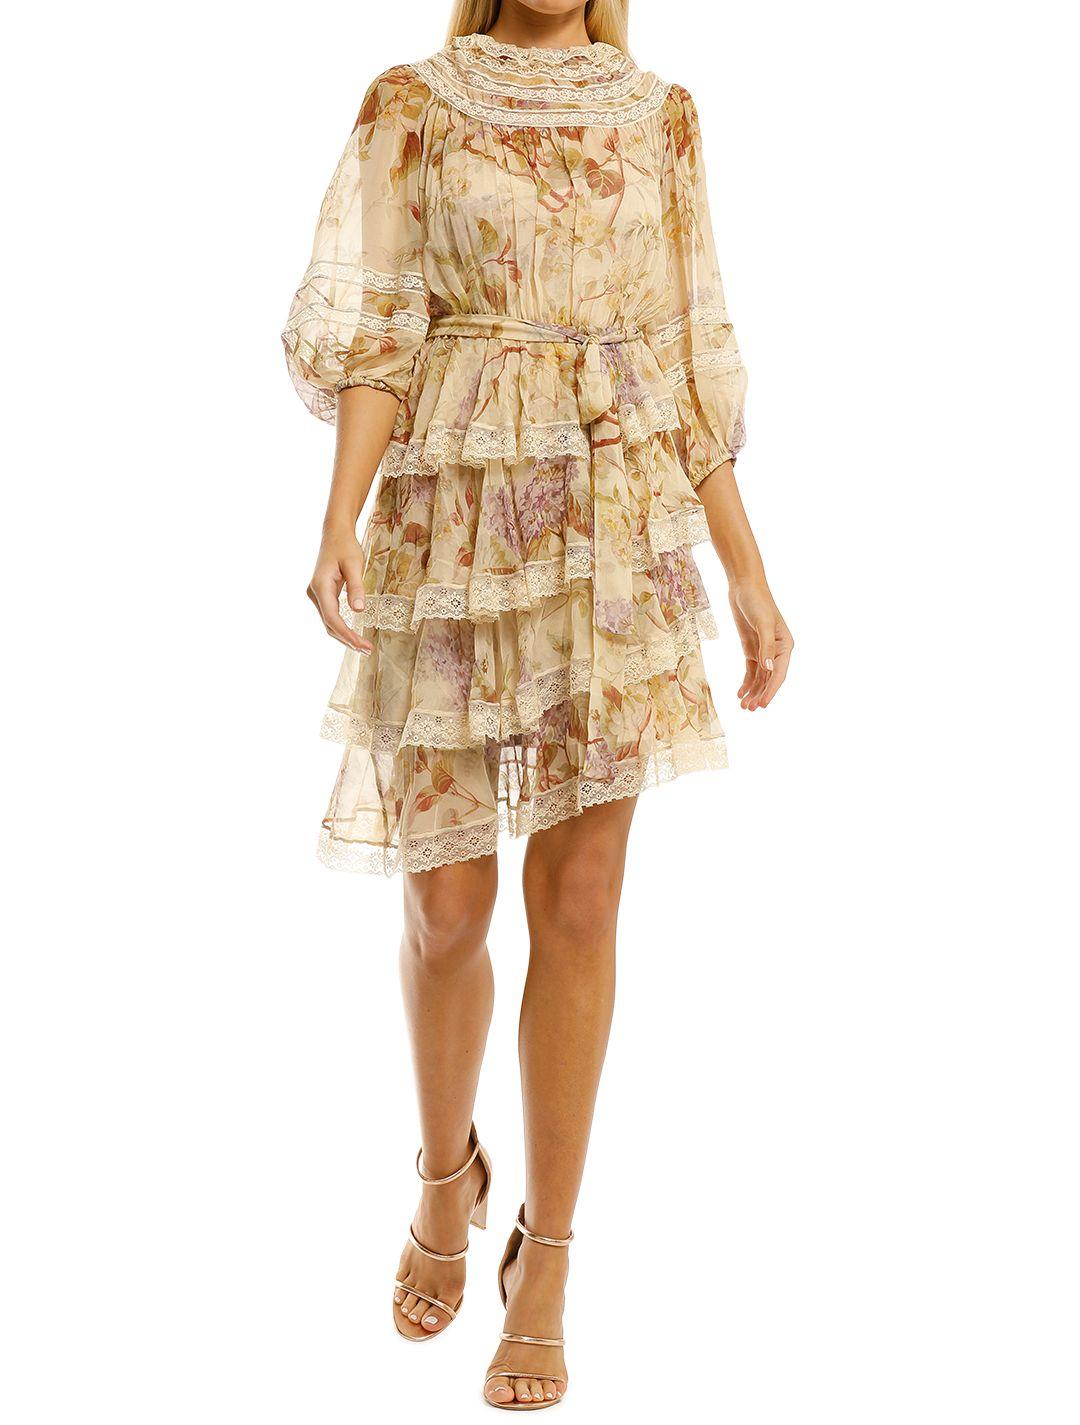 Zimmermann-Sabotage-Tiered-Lace-Mini-Dress-Cream-Wisteria-Front